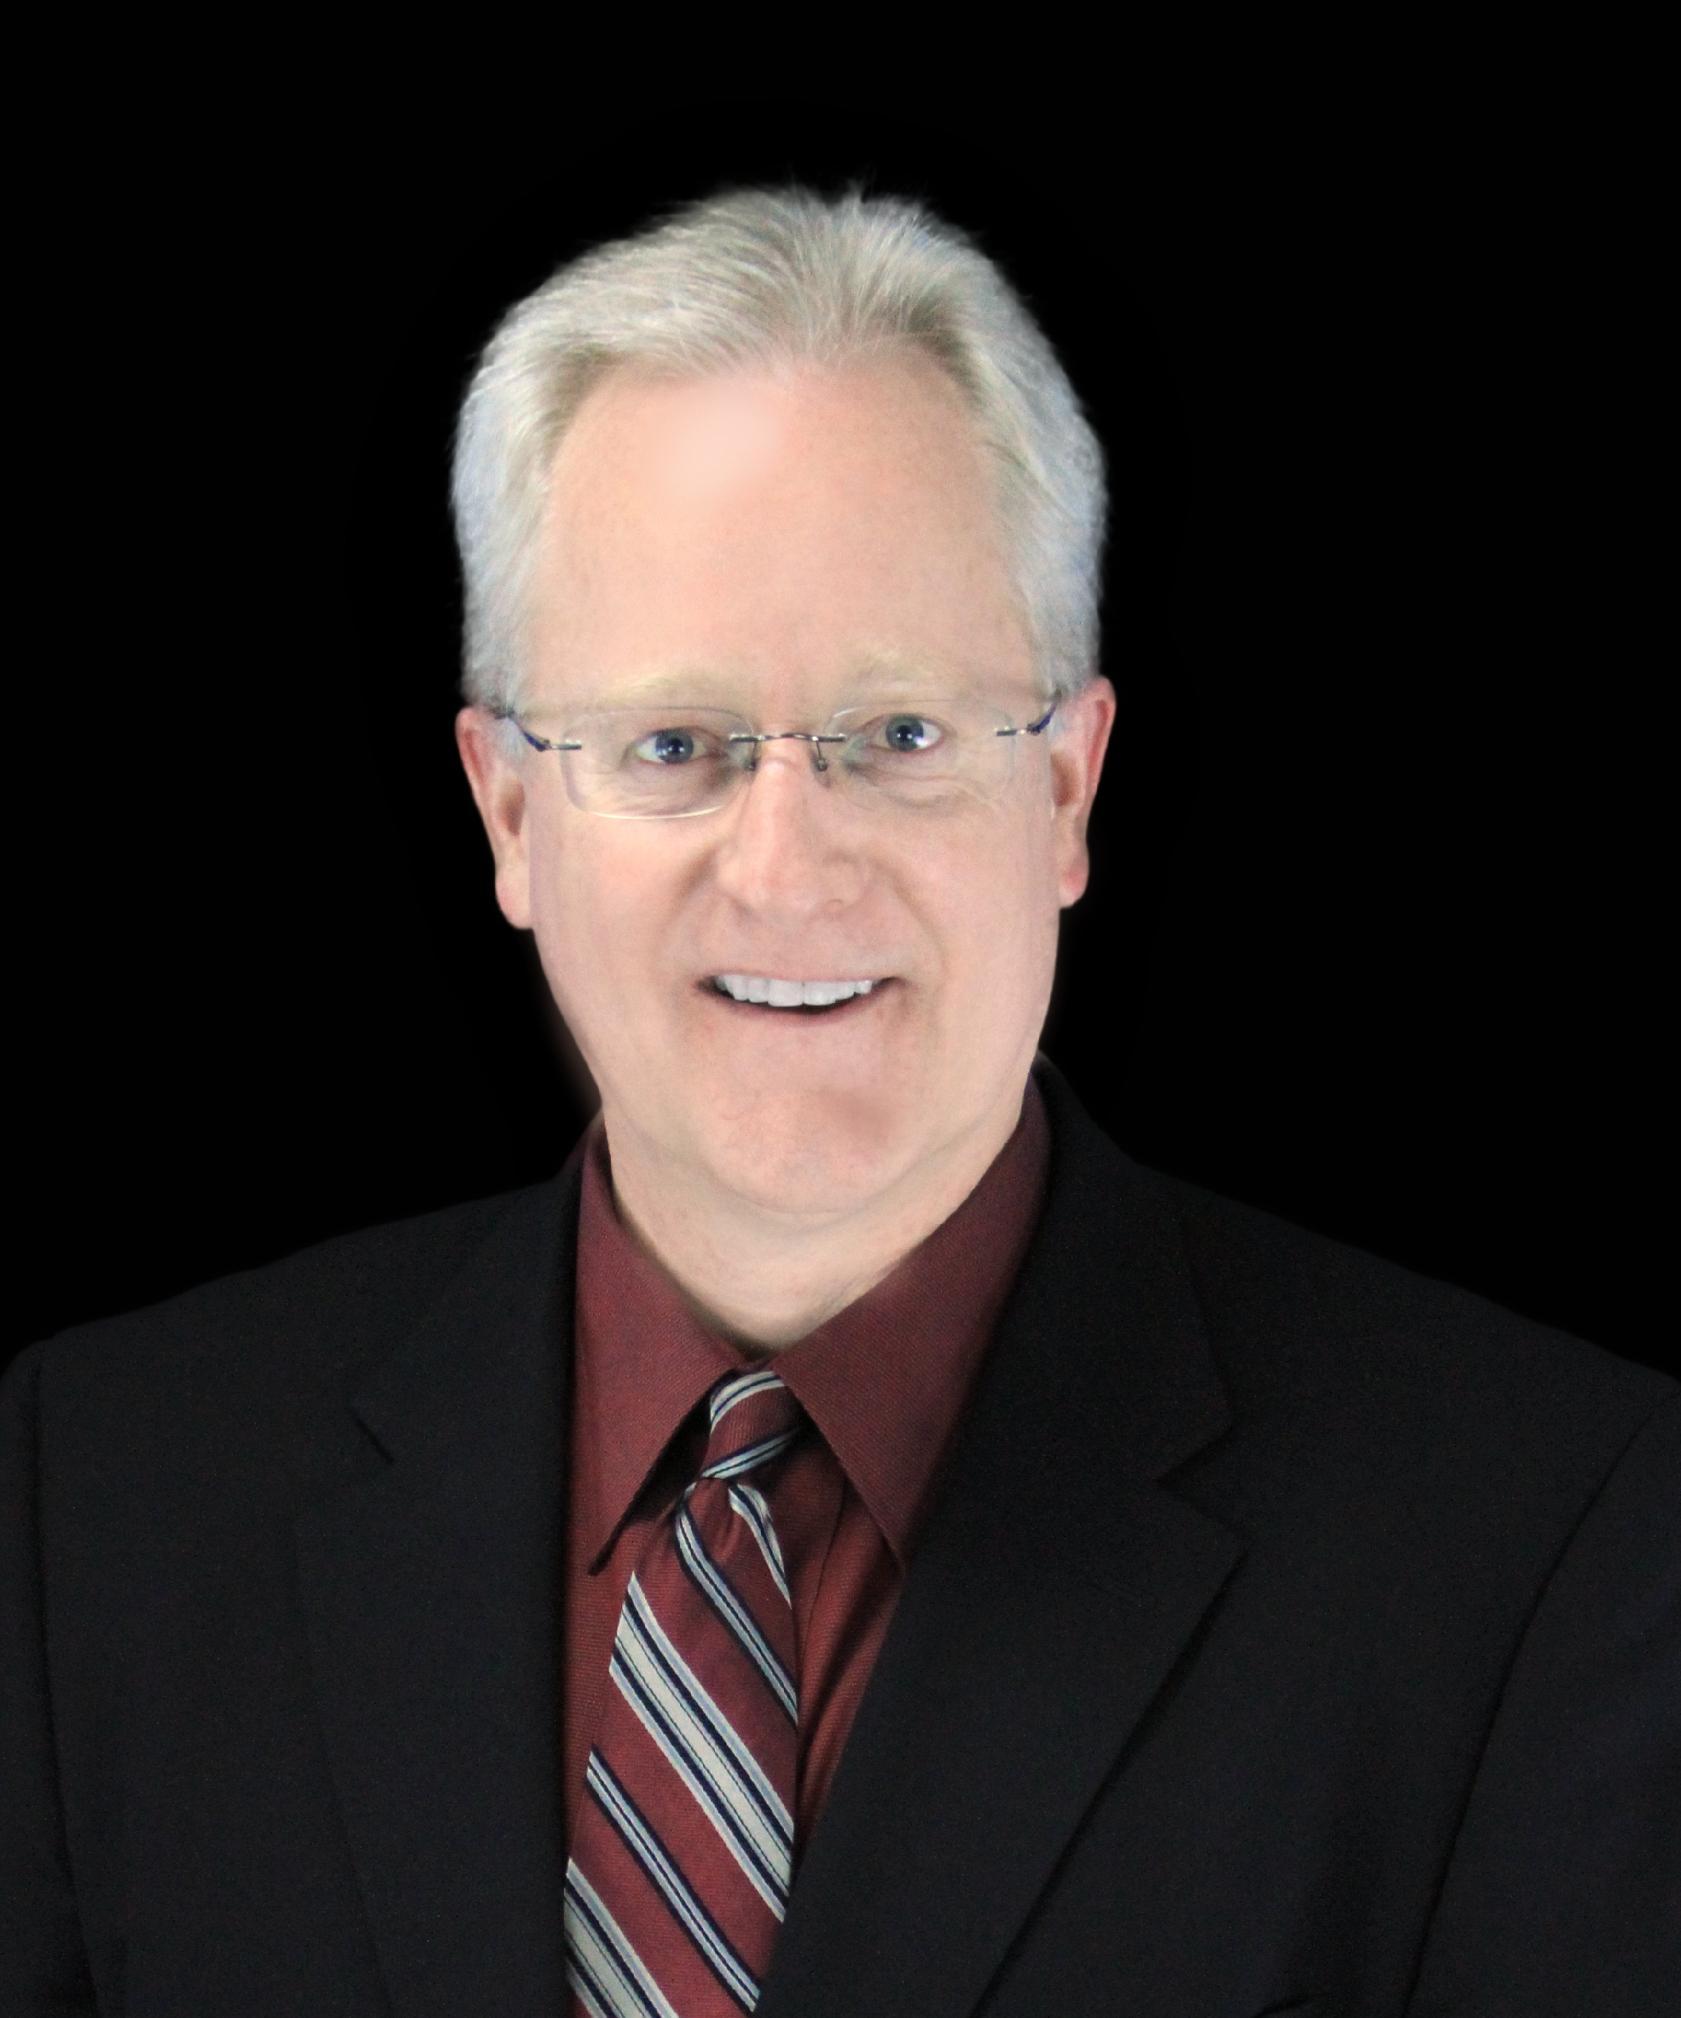 Darren Adamson, PhD